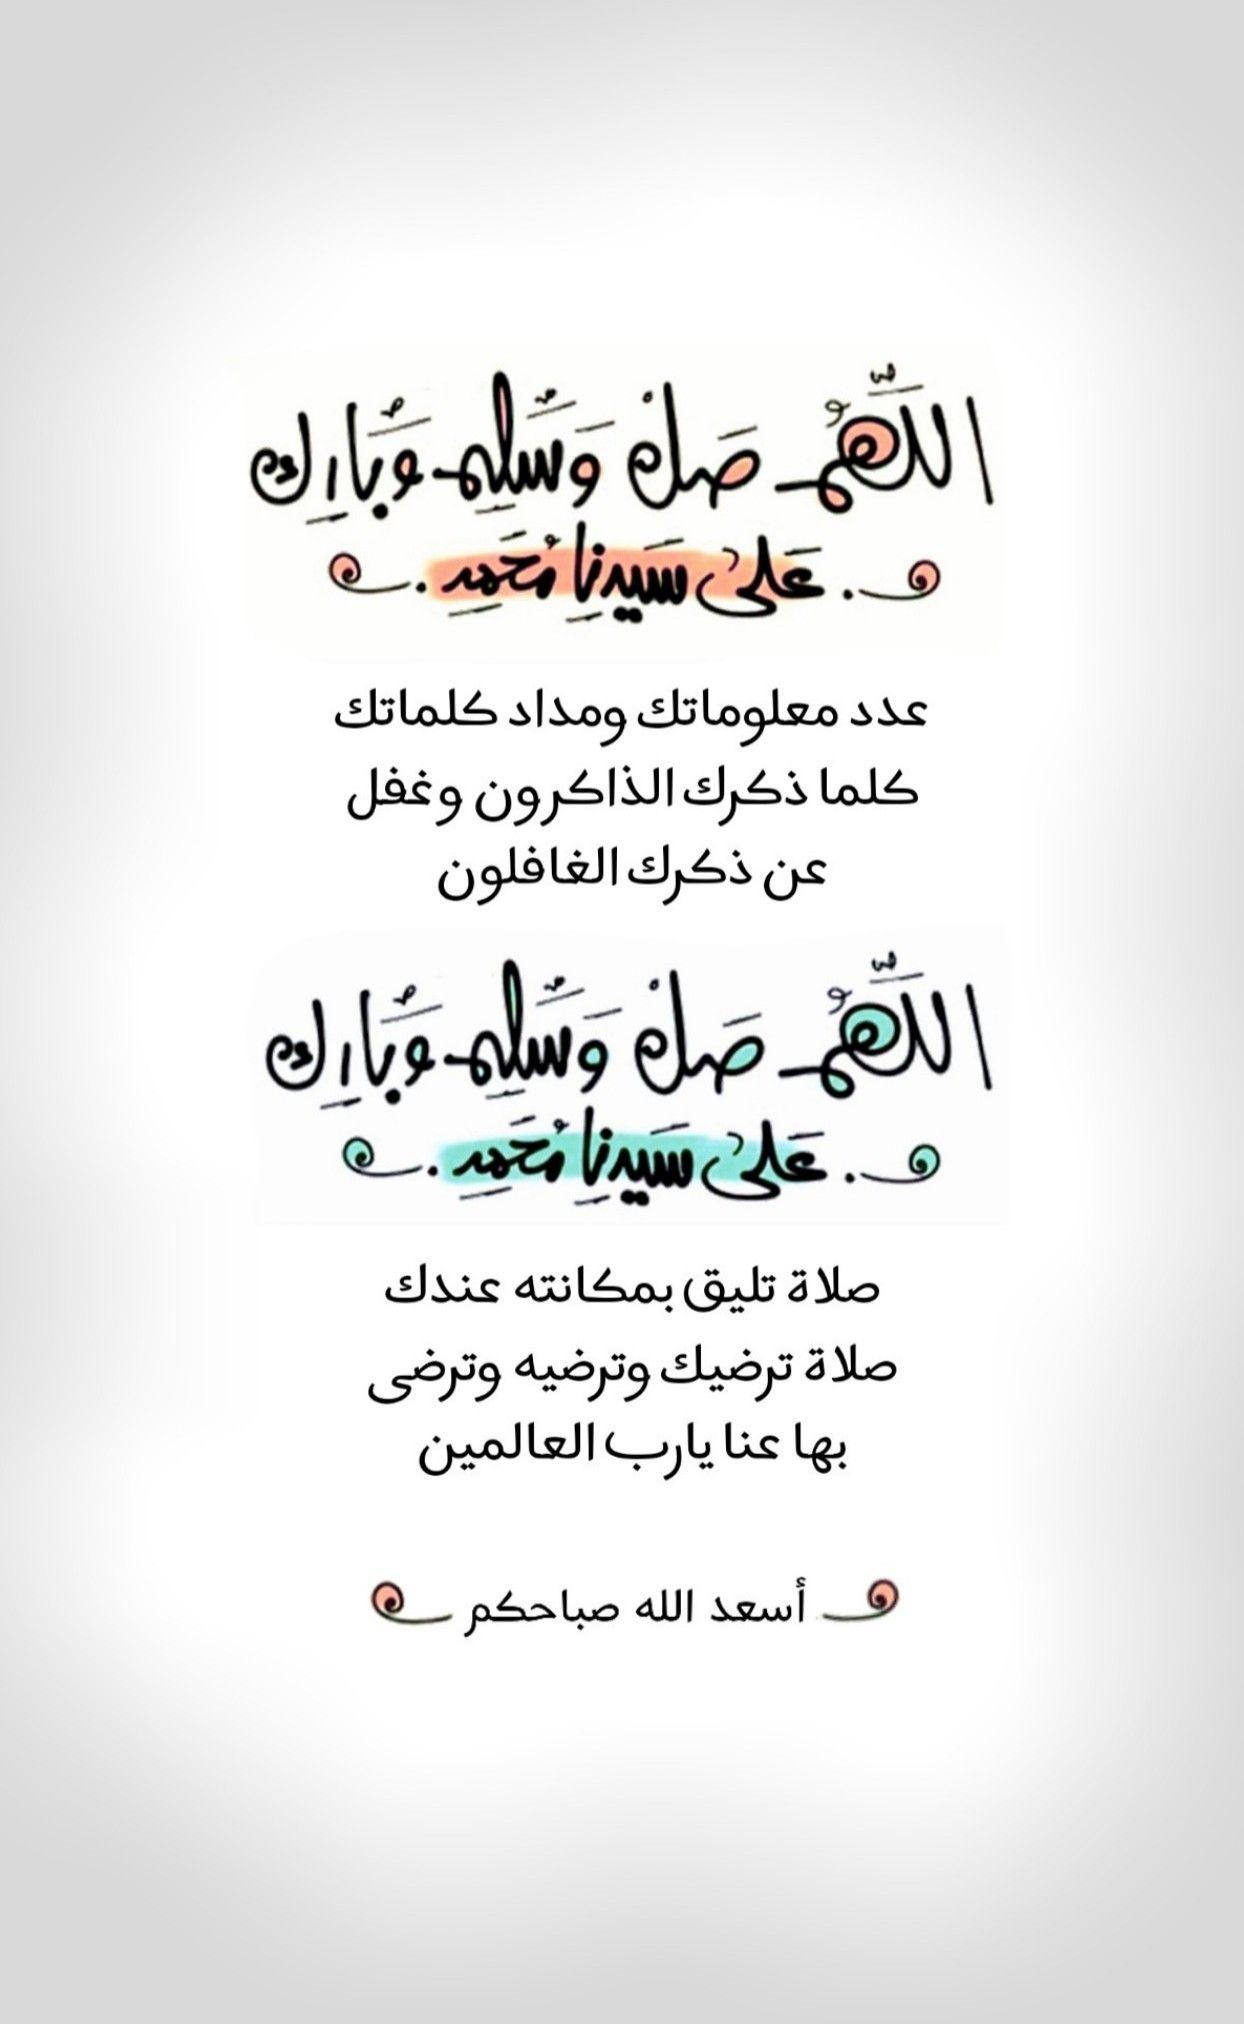 ا لل ه م ص ل و س ل م و ب ار ك على ن ب ي ن ا م ح م د عدد معلوماتك ومداد كلماتك كلما ذكرك الذاكرون Islamic Quotes Quran Quotes Islamic Quotes Quran